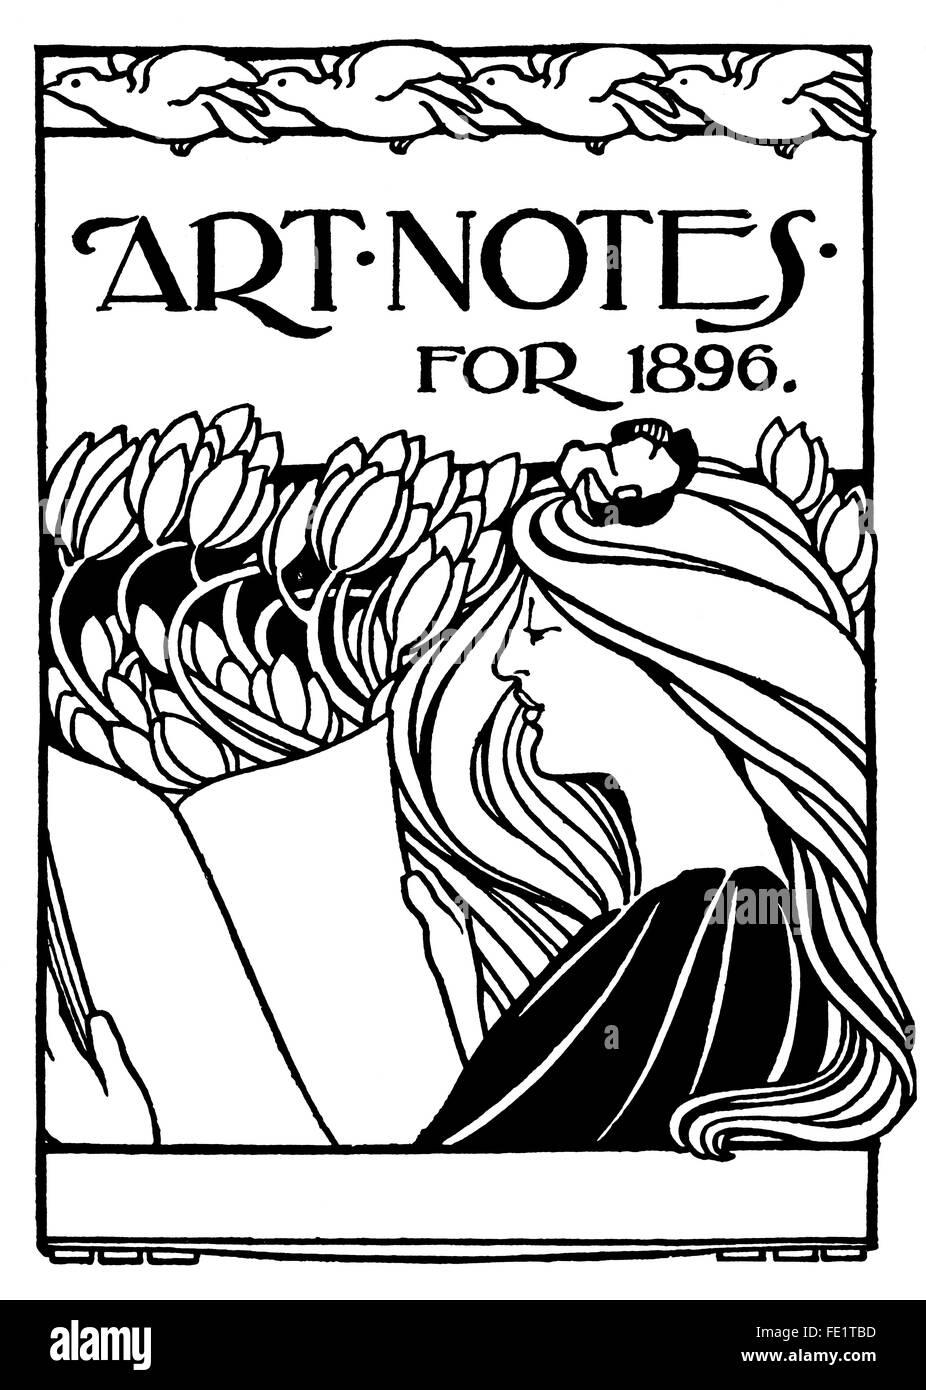 Art Notes for 1896, art nouveau book cover design by Arthur Maude of Chelsea, London, line Illustration 1897 Studio - Stock Image